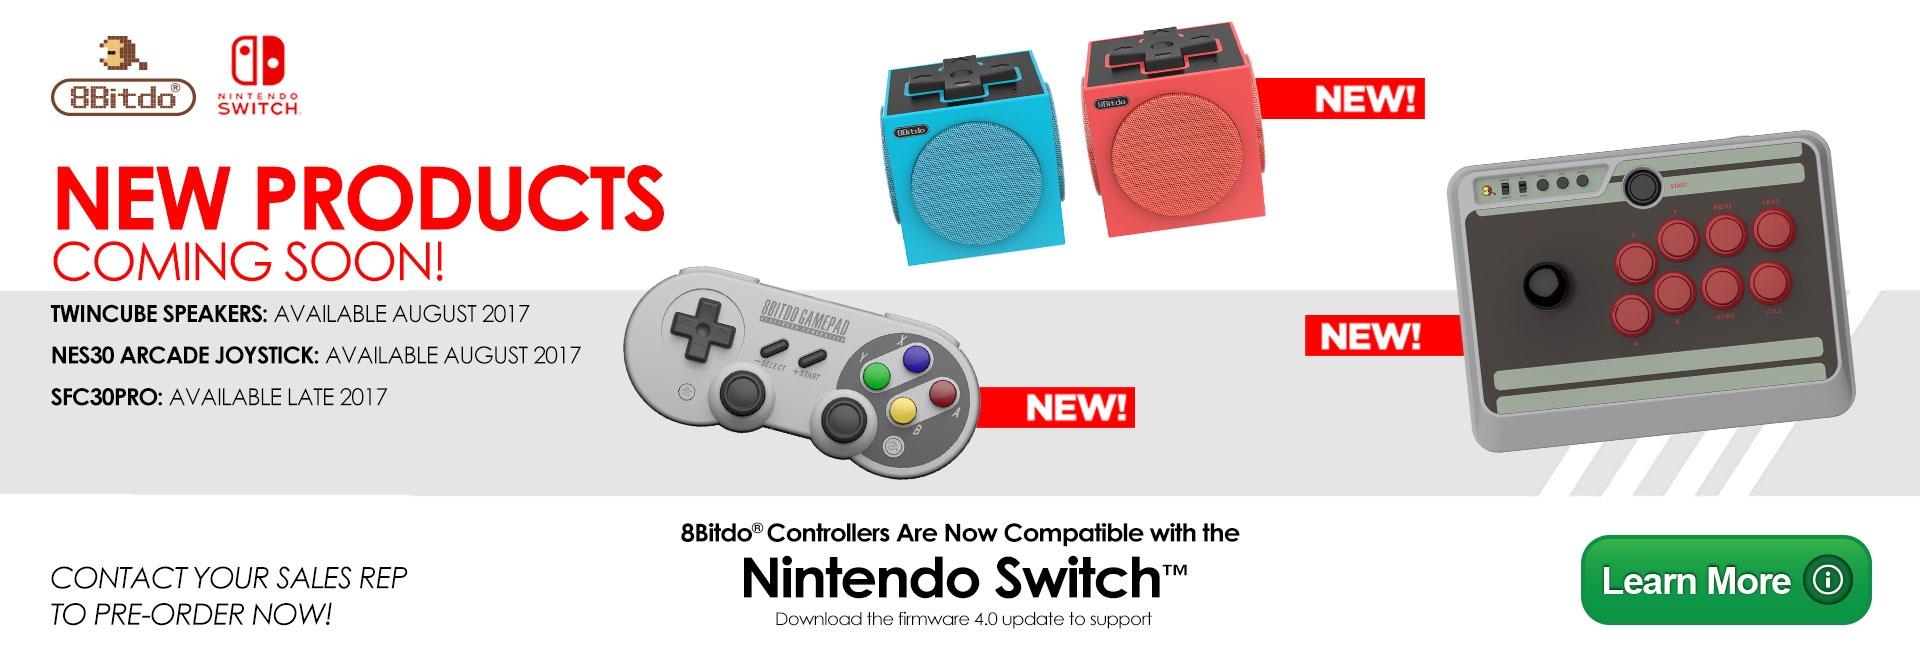 8Bitdo New Releases